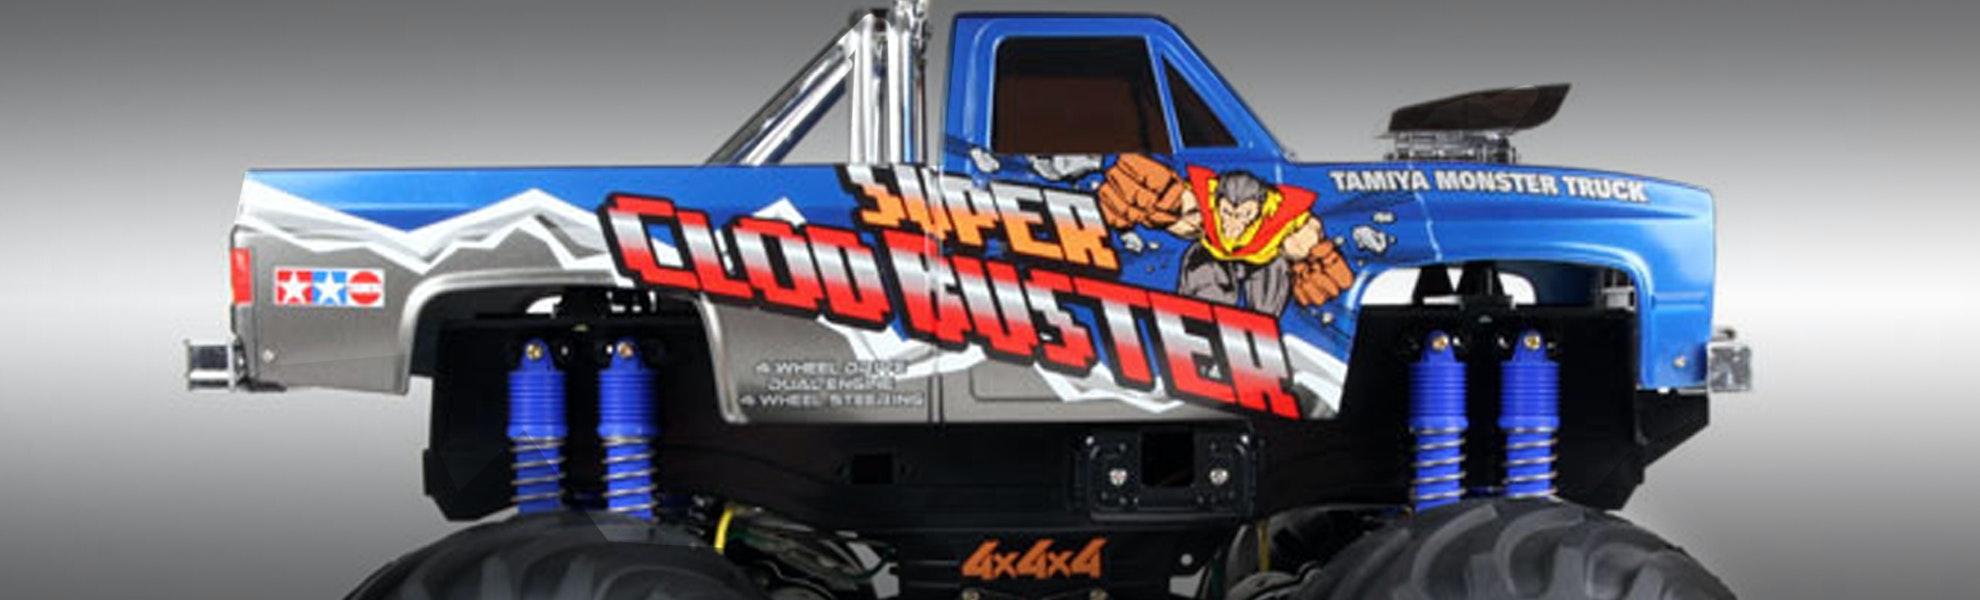 Tamiya Super Clod Buster 4X4X4 Kit